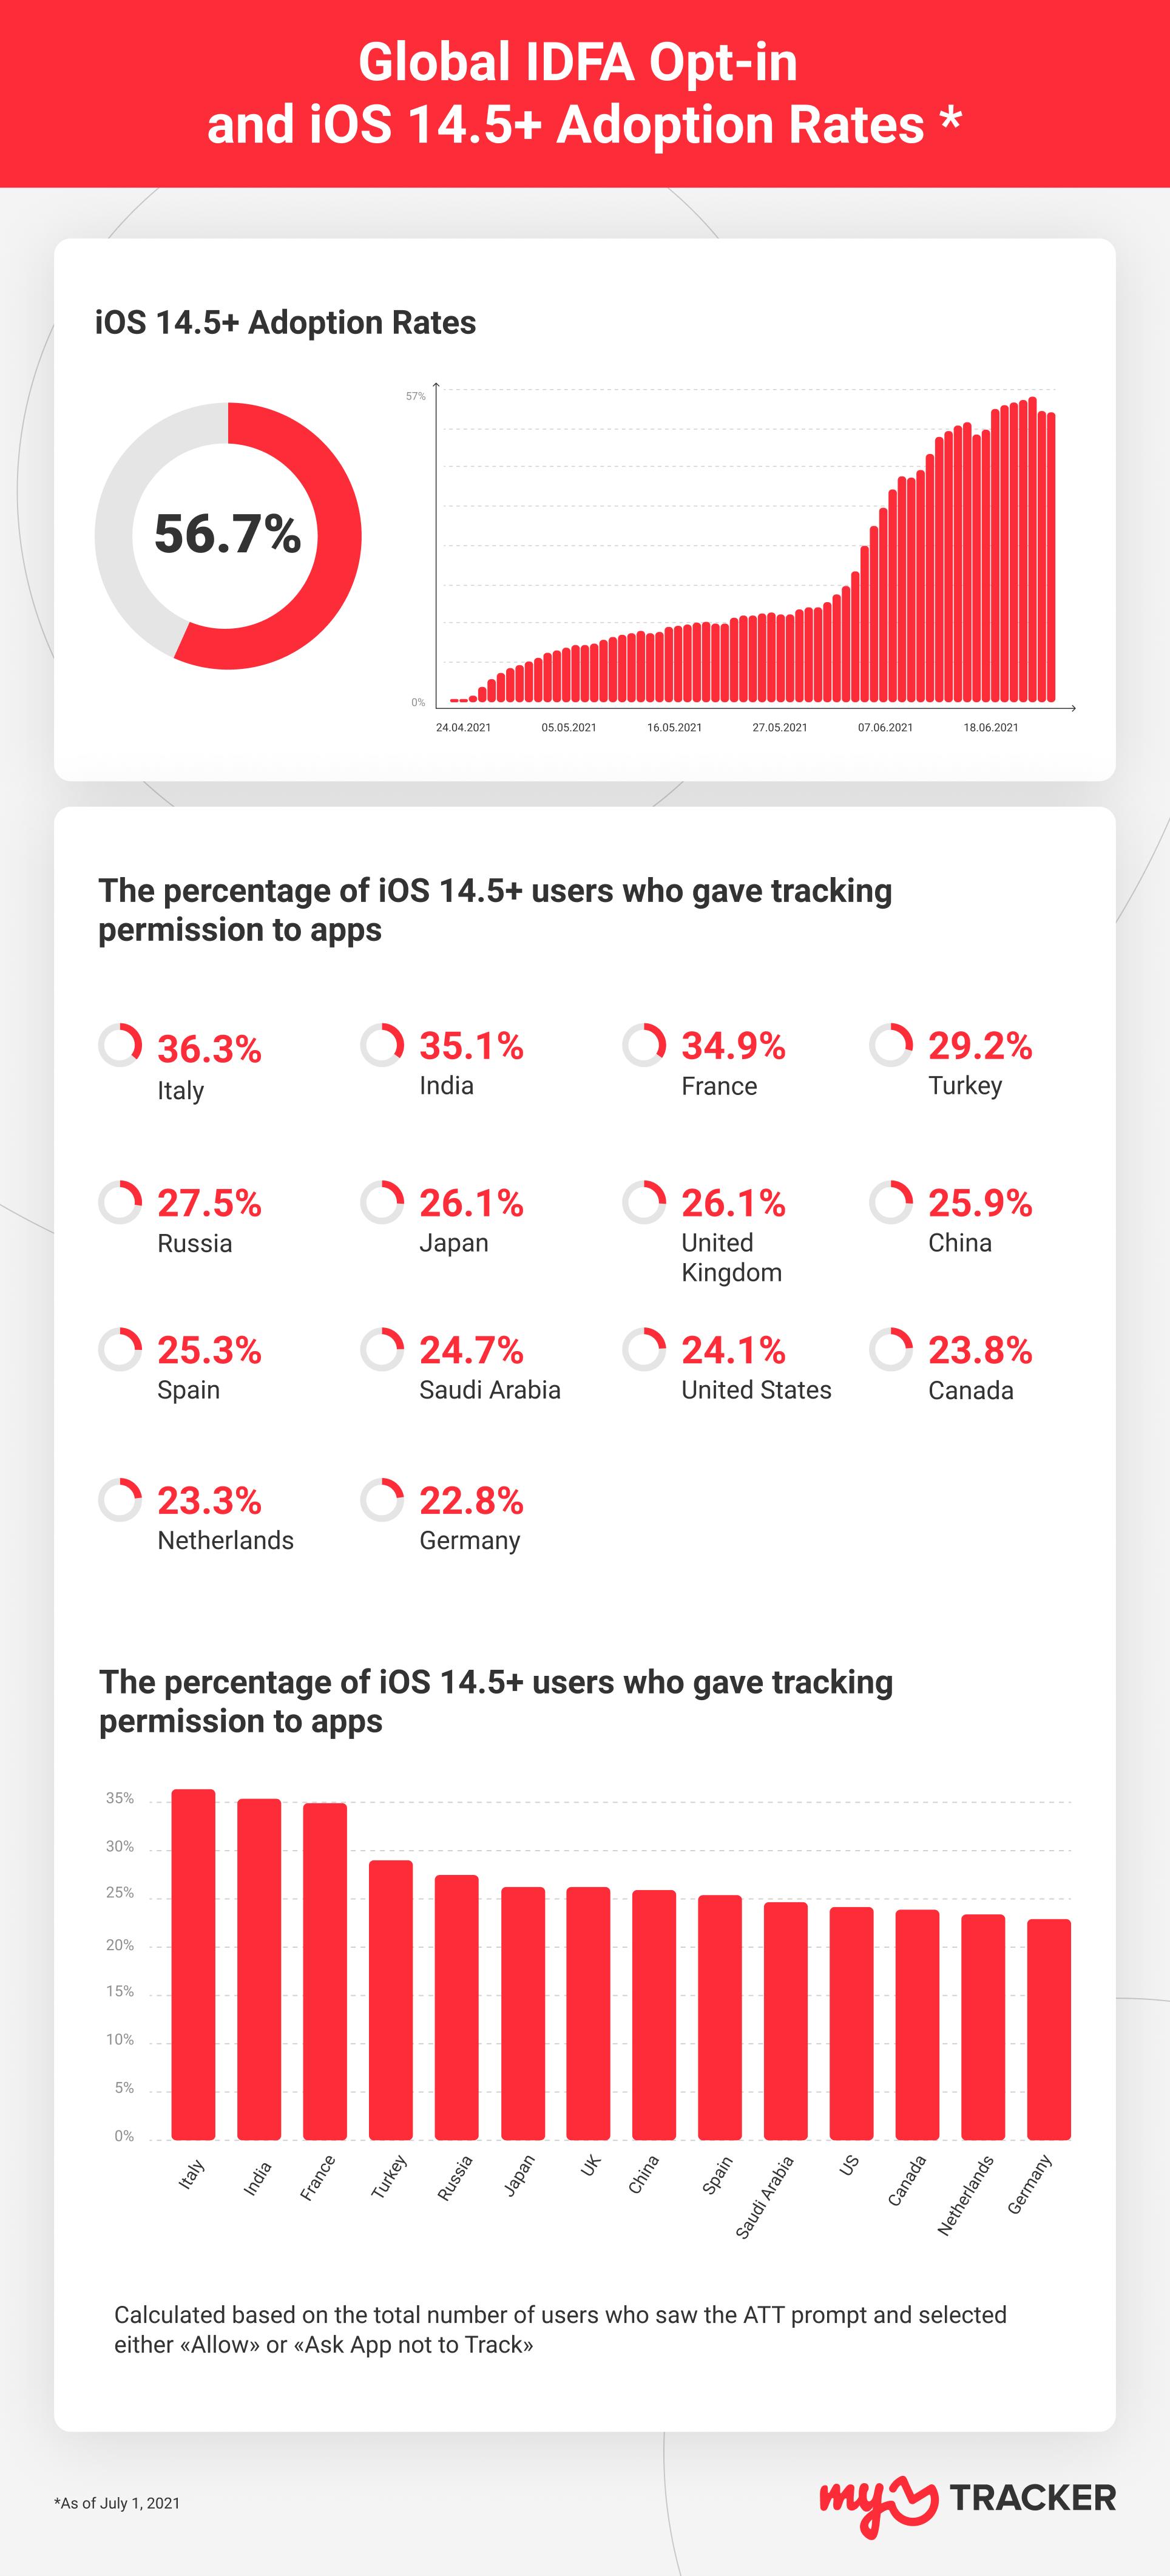 global IDFA and iOS 14.5+ adoptions rates month 2